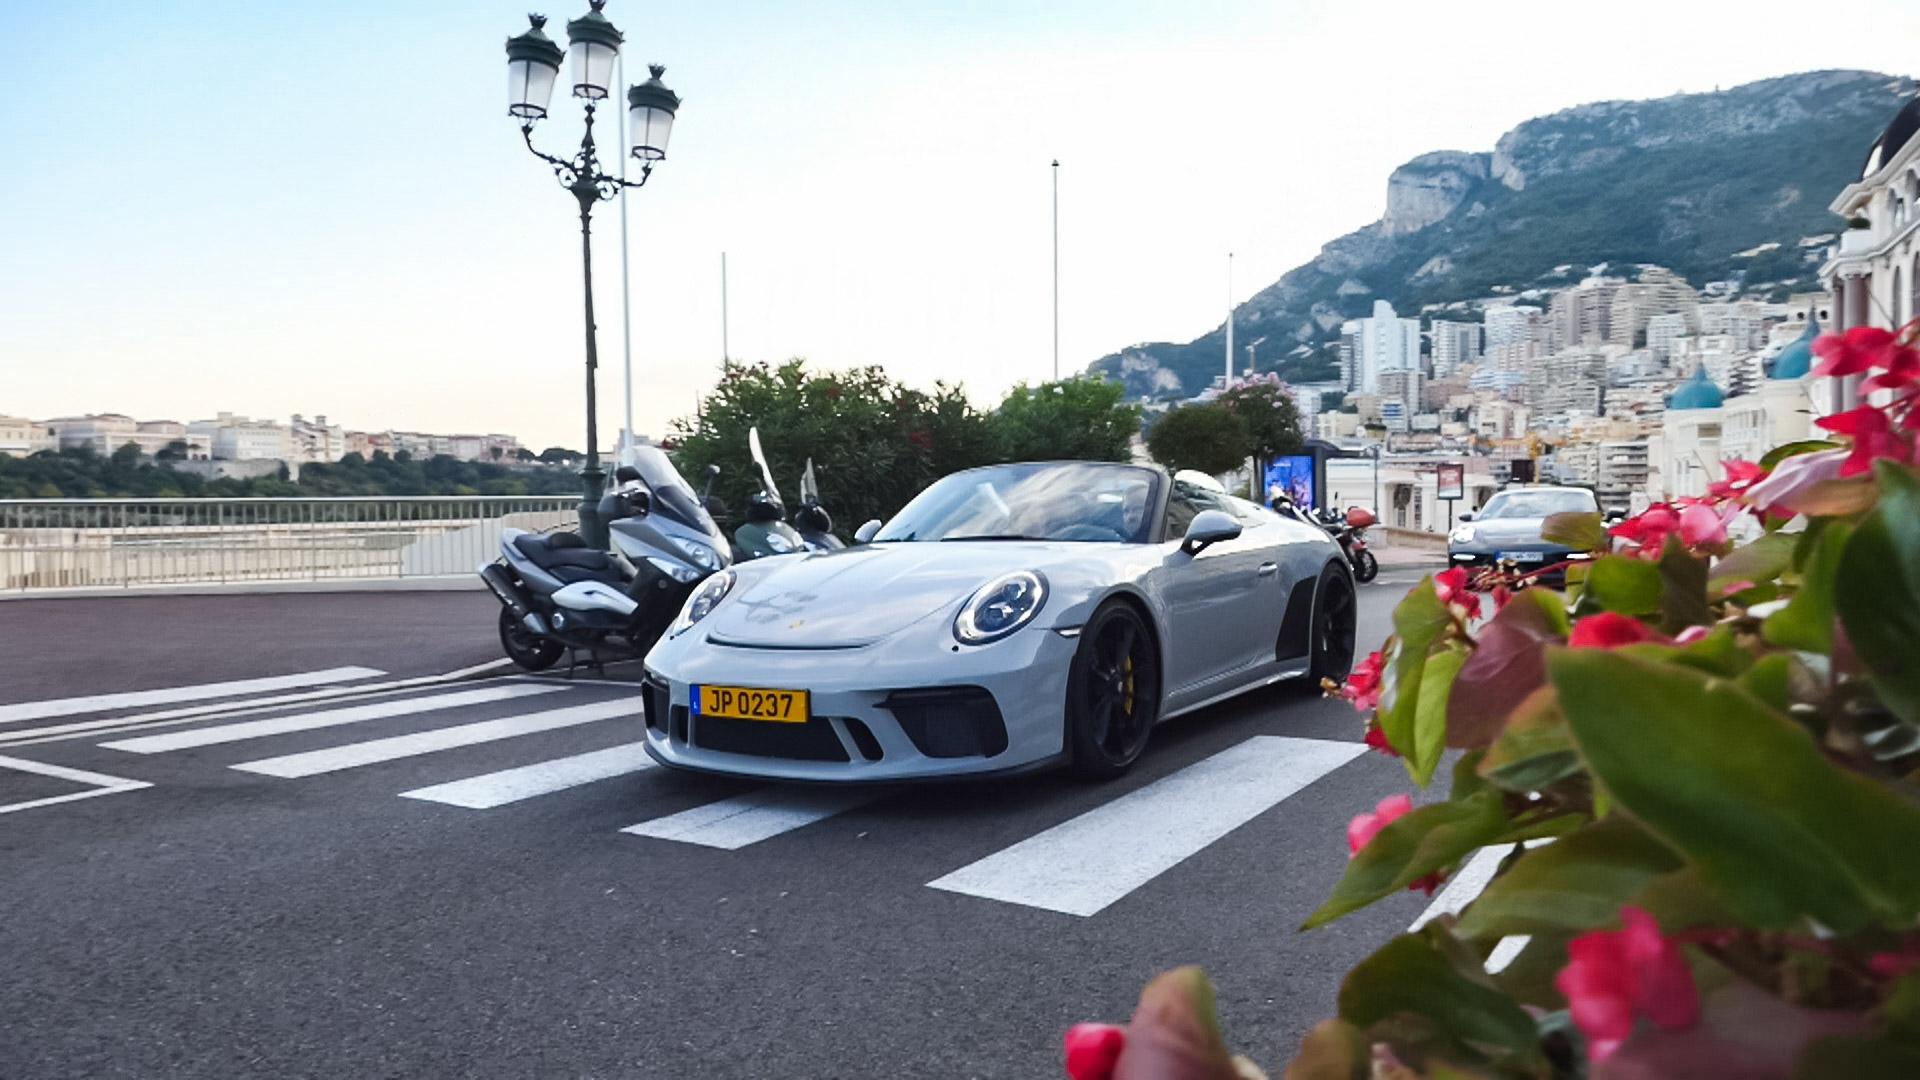 Porsche 991 Speedster - JP-0237 (LUX)